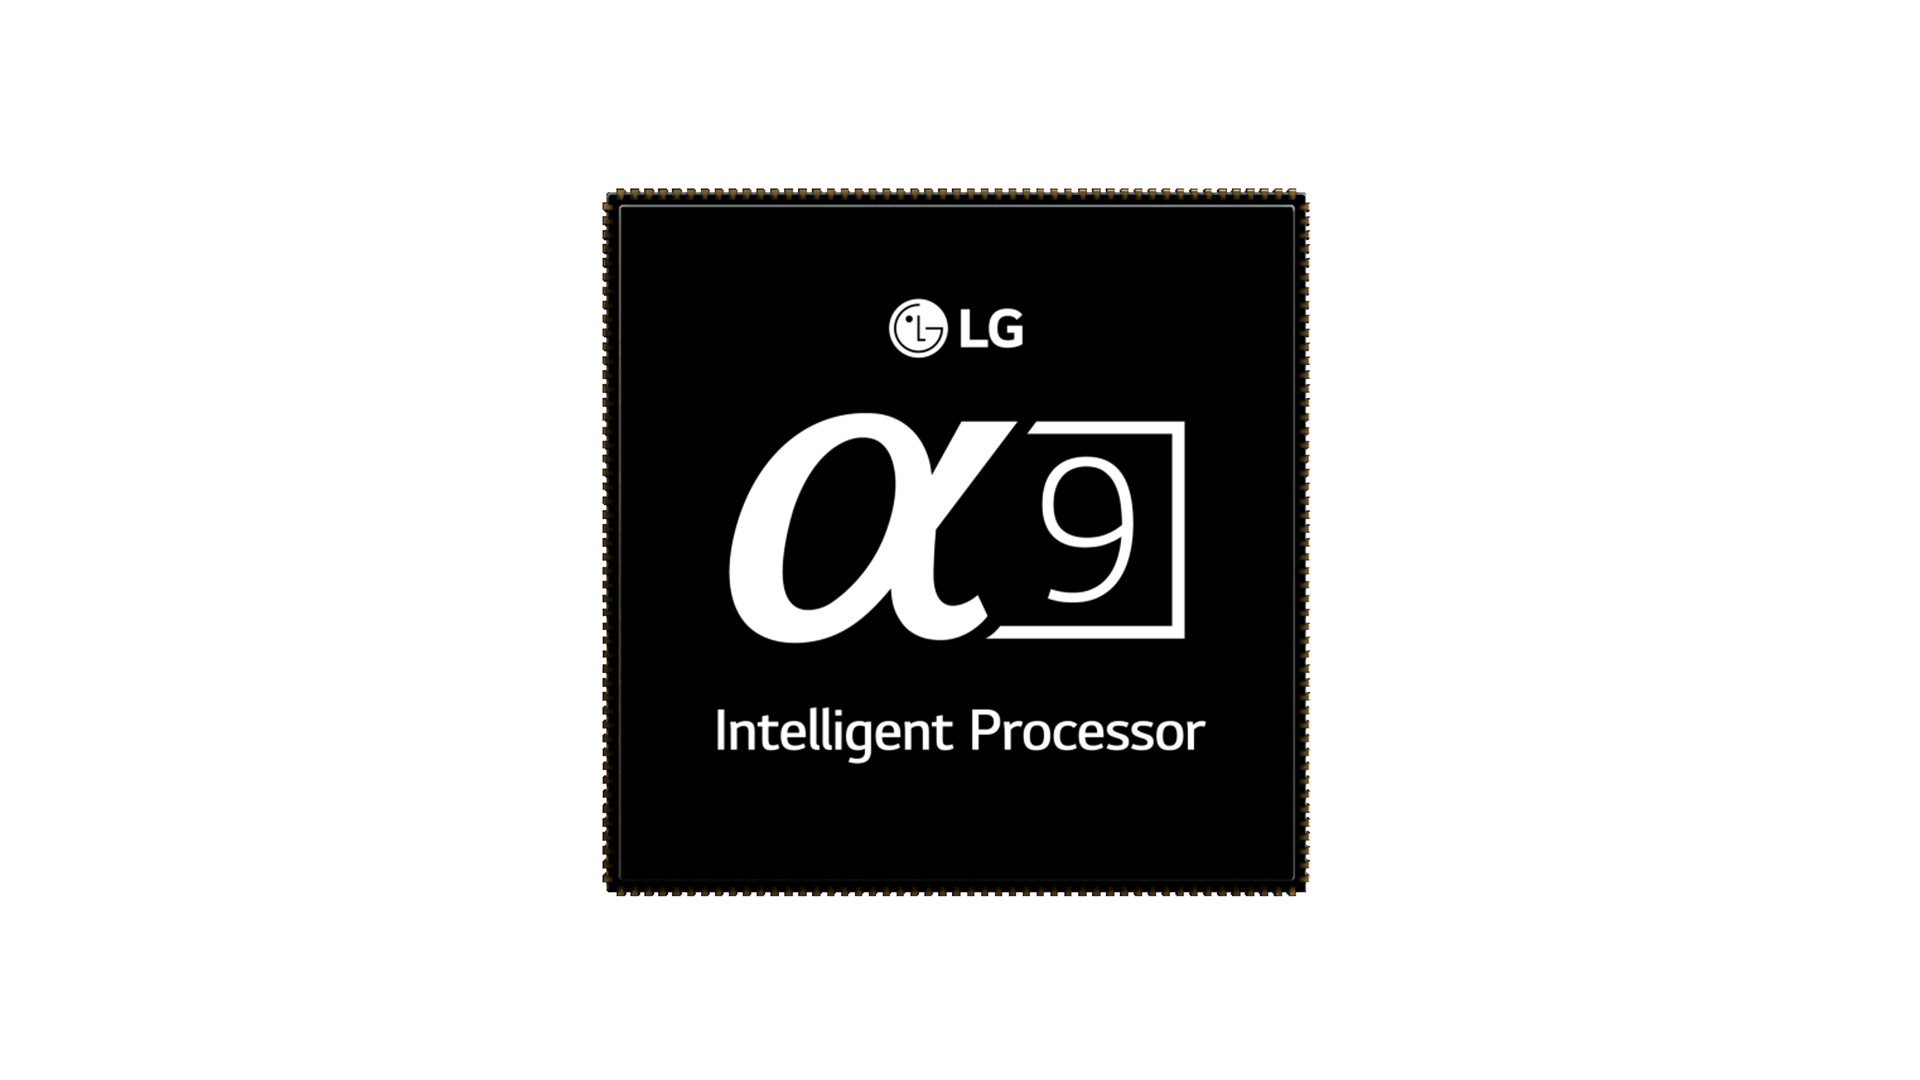 LG Alpha 9 Intelligent Processor